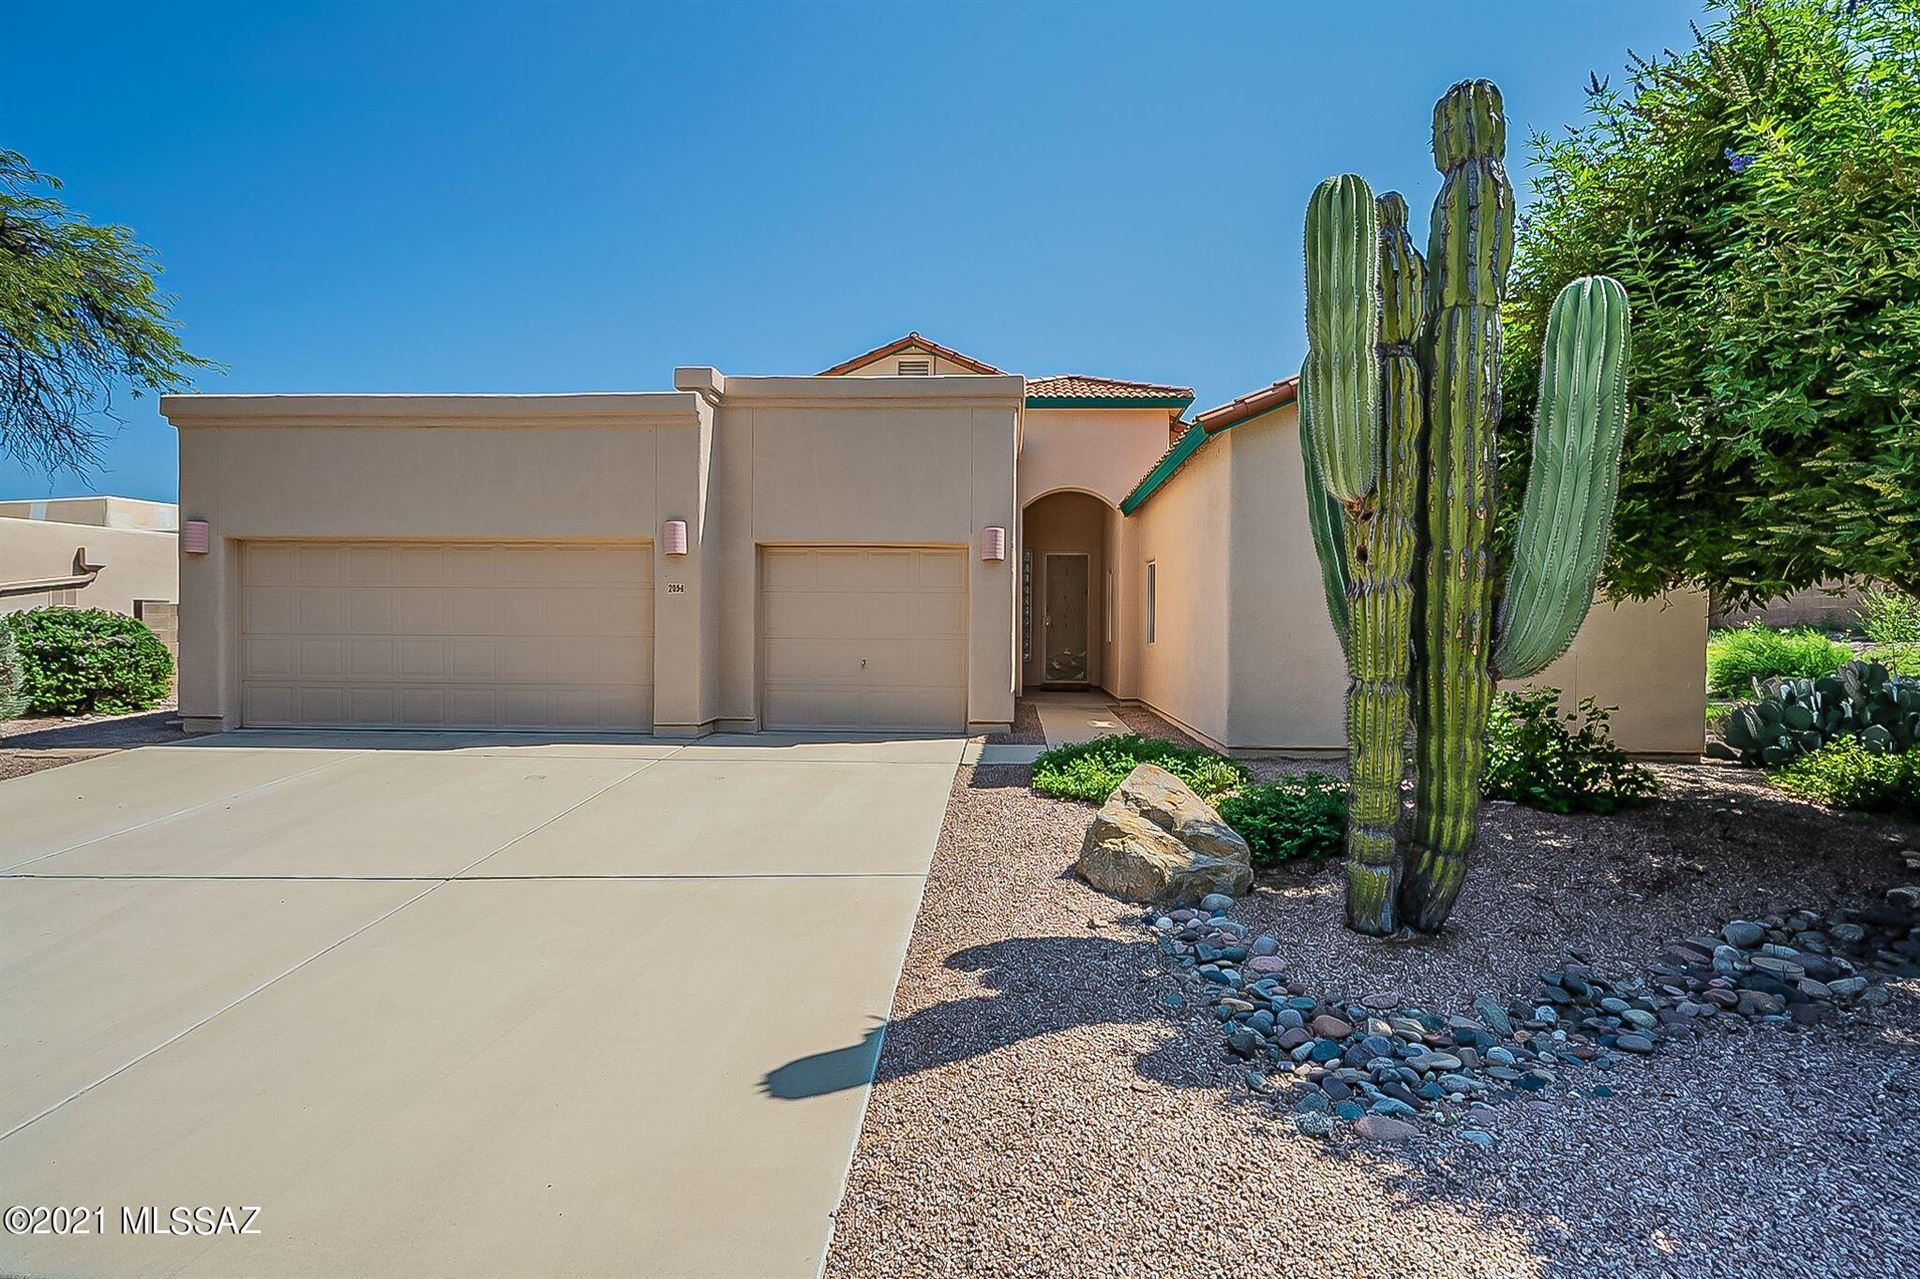 2054 N Wild Hyacinth Drive, Tucson, AZ 85715 - #: 22123712